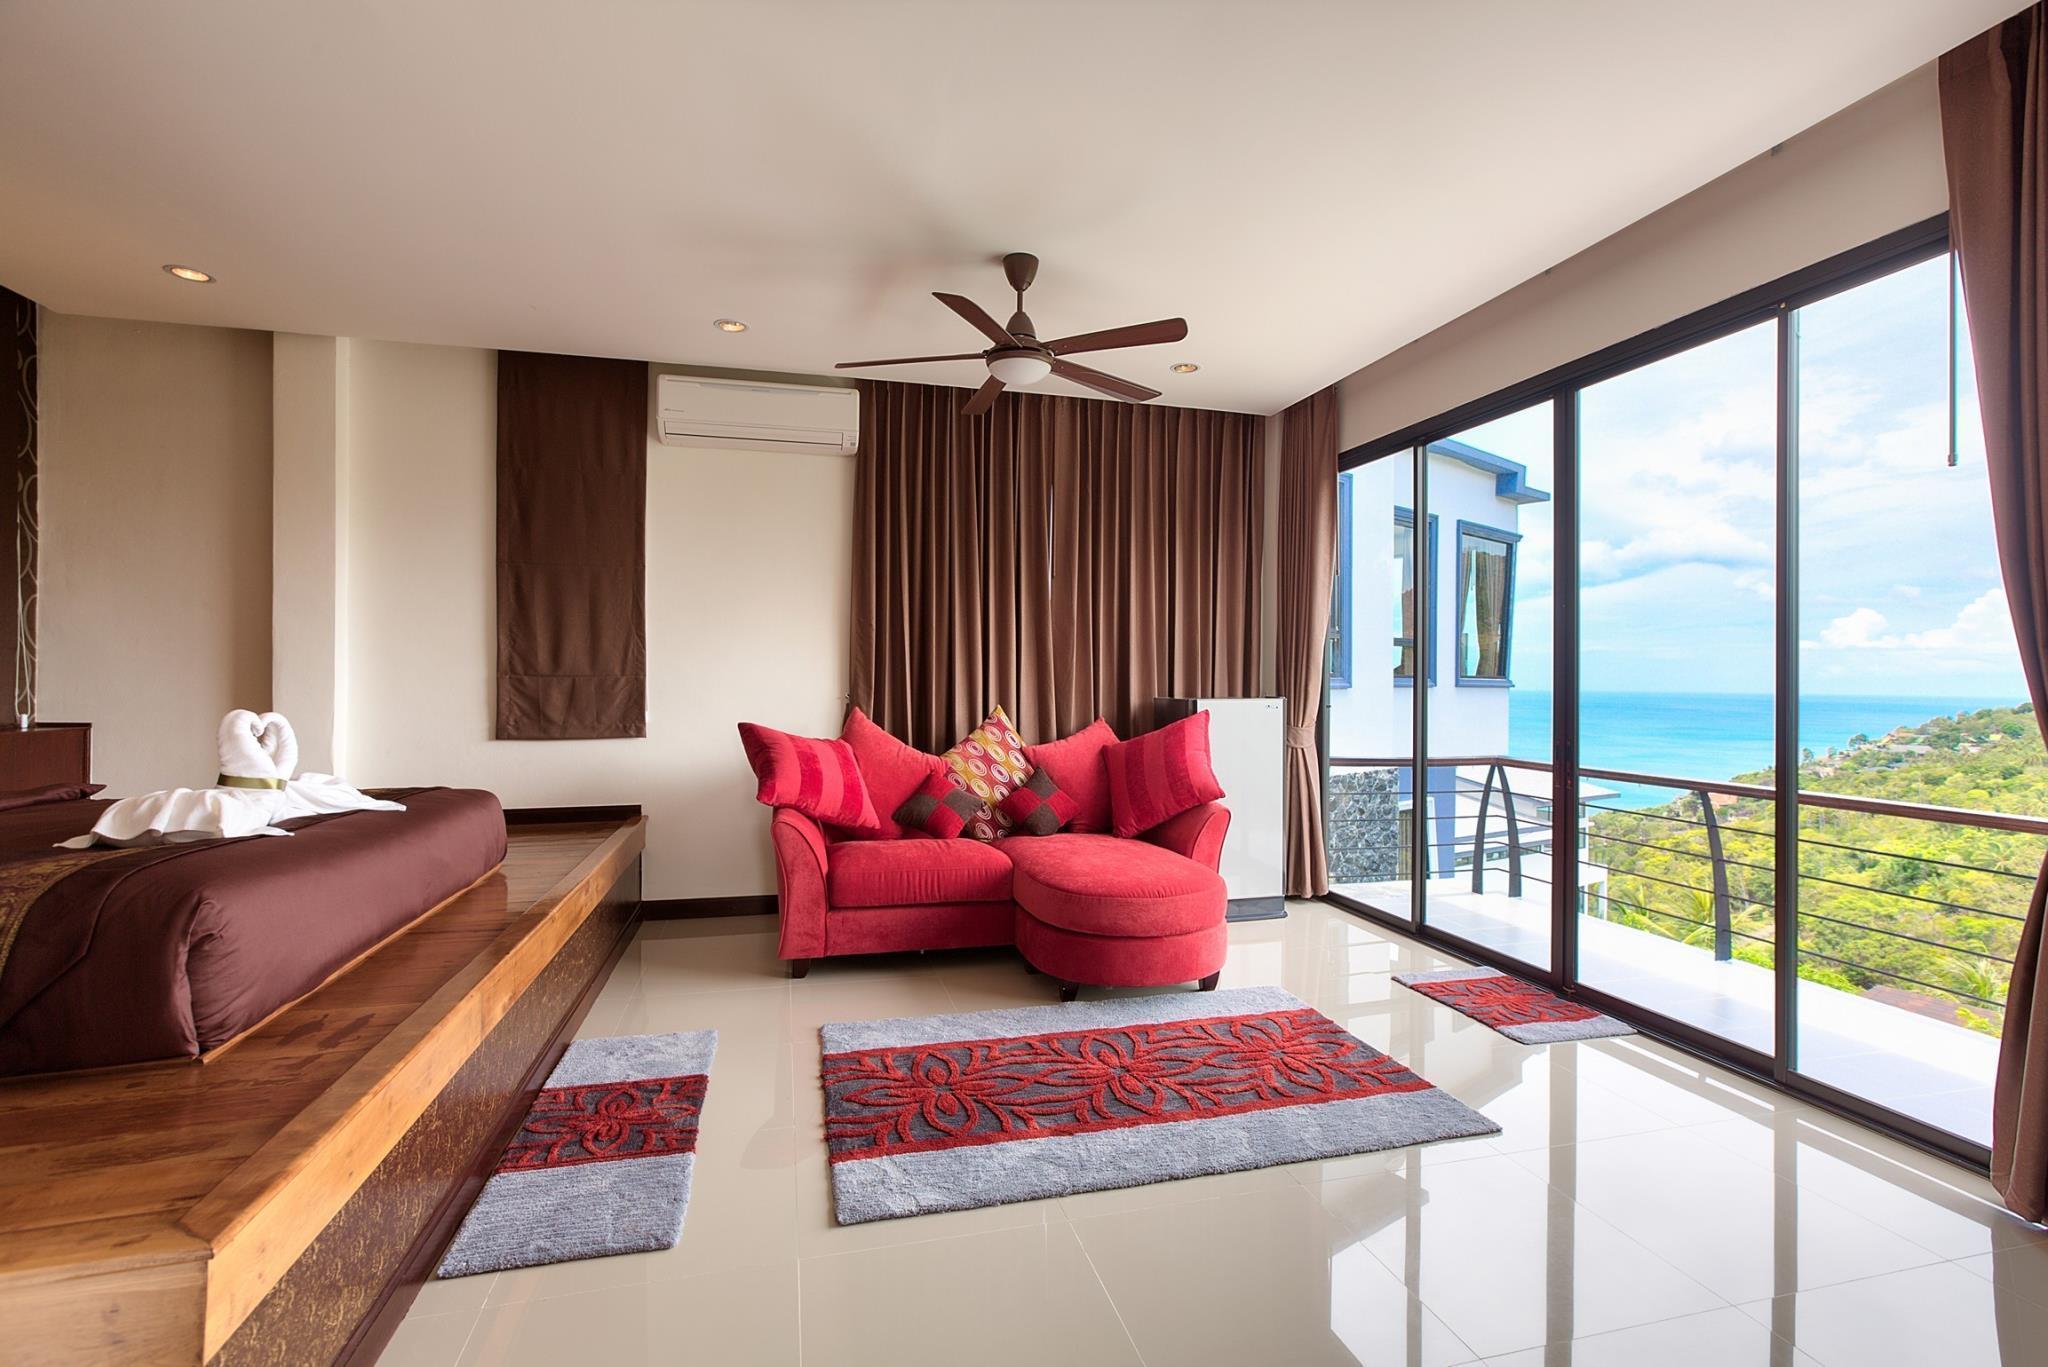 Best Price on NB Sunrise Mountain Resort in Samui + Reviews